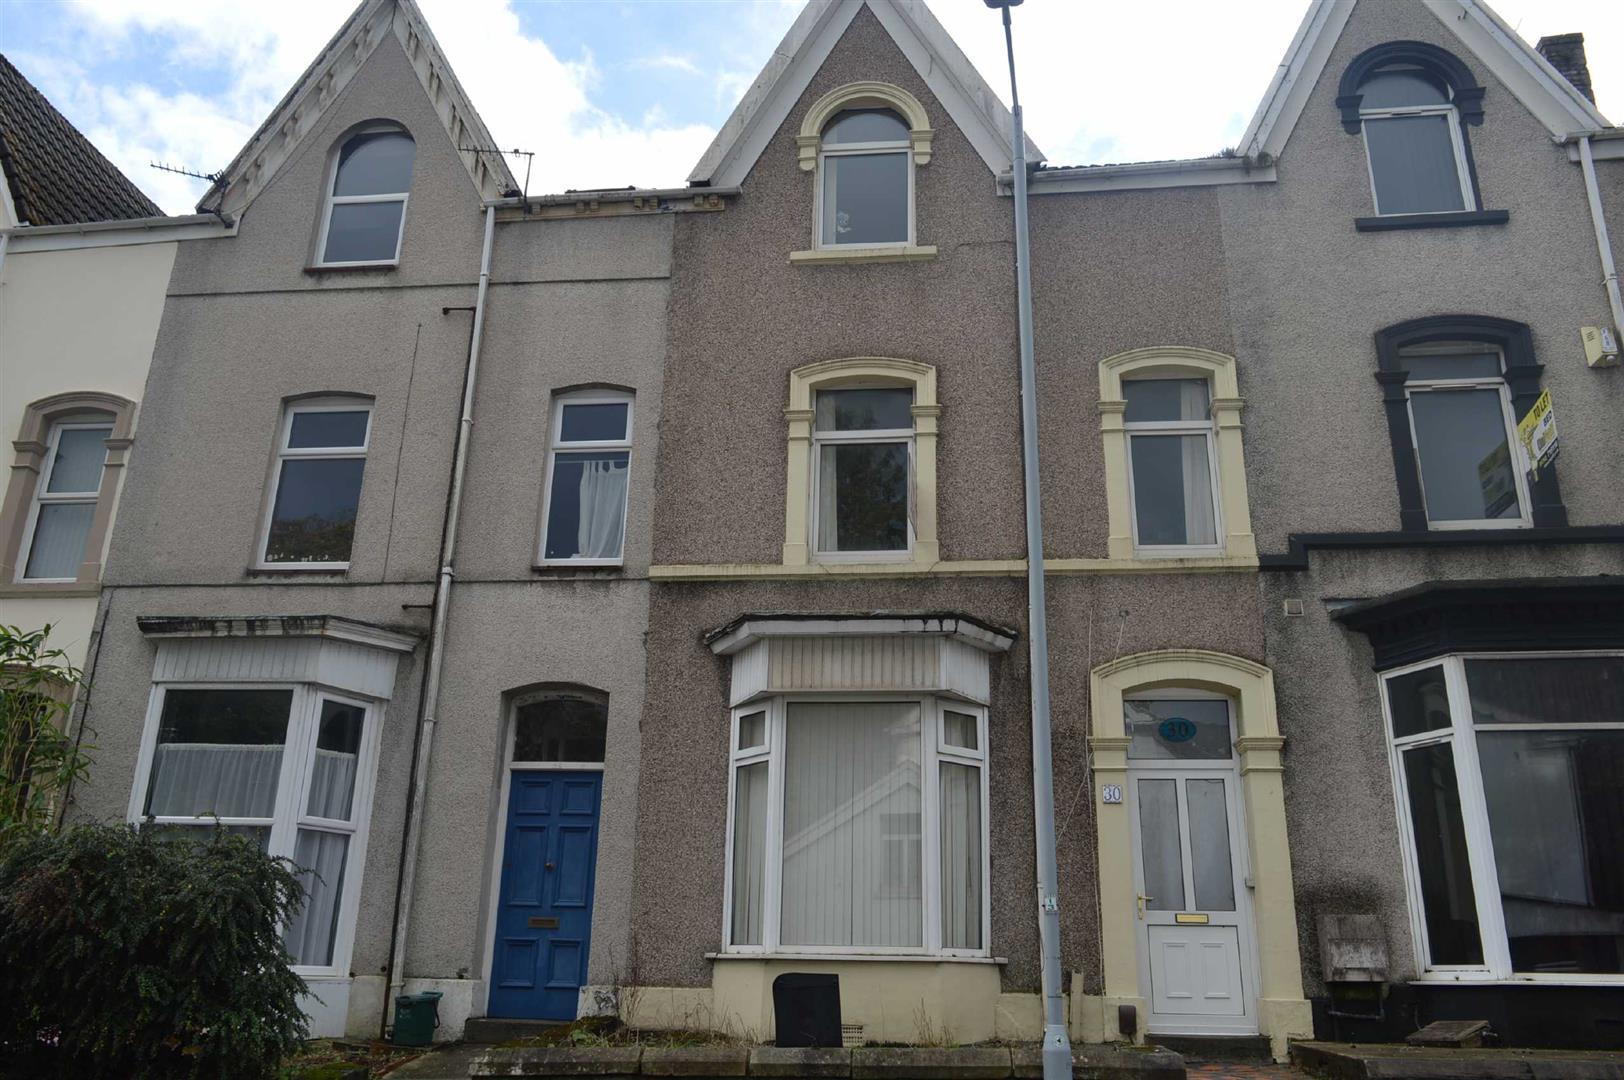 Bryn Y Mor Crescent, Swansea, SA1 4QH